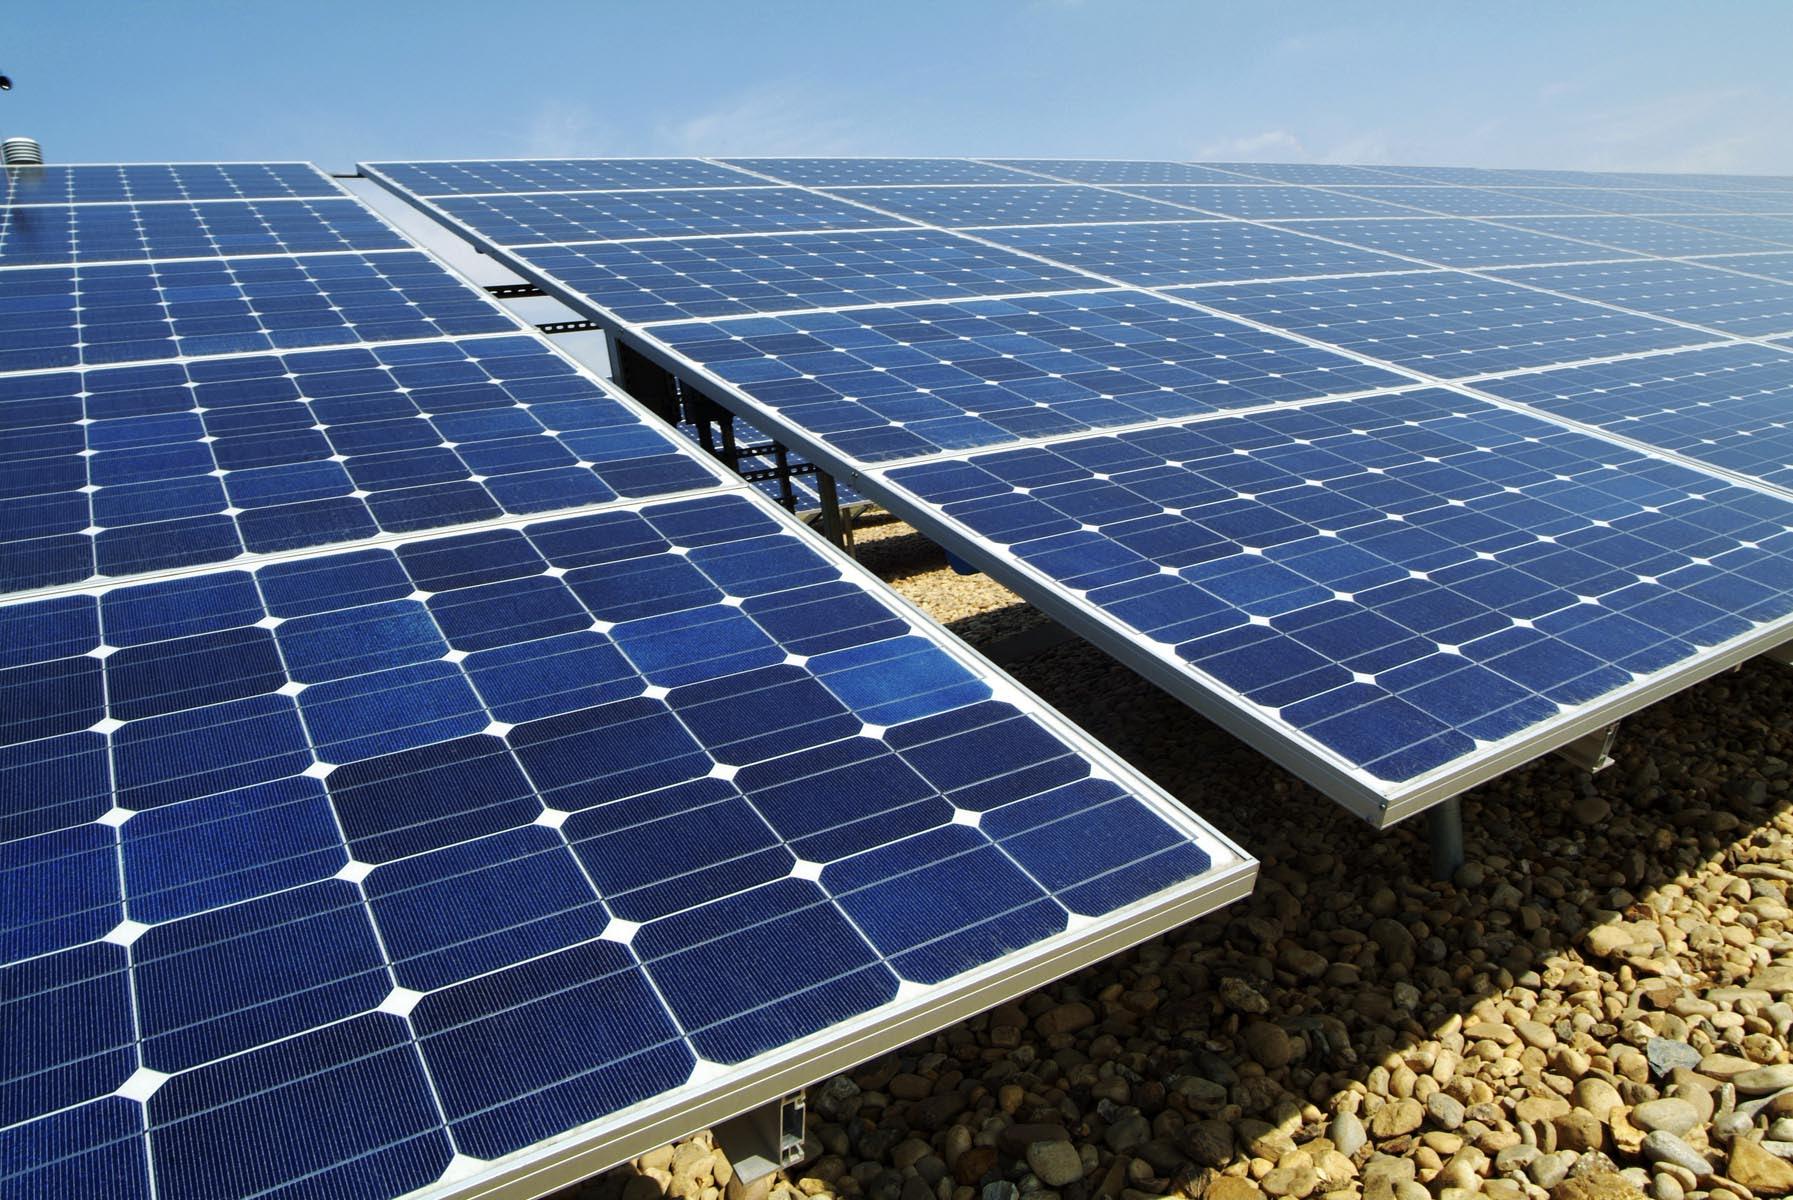 Photovoltaic solar power